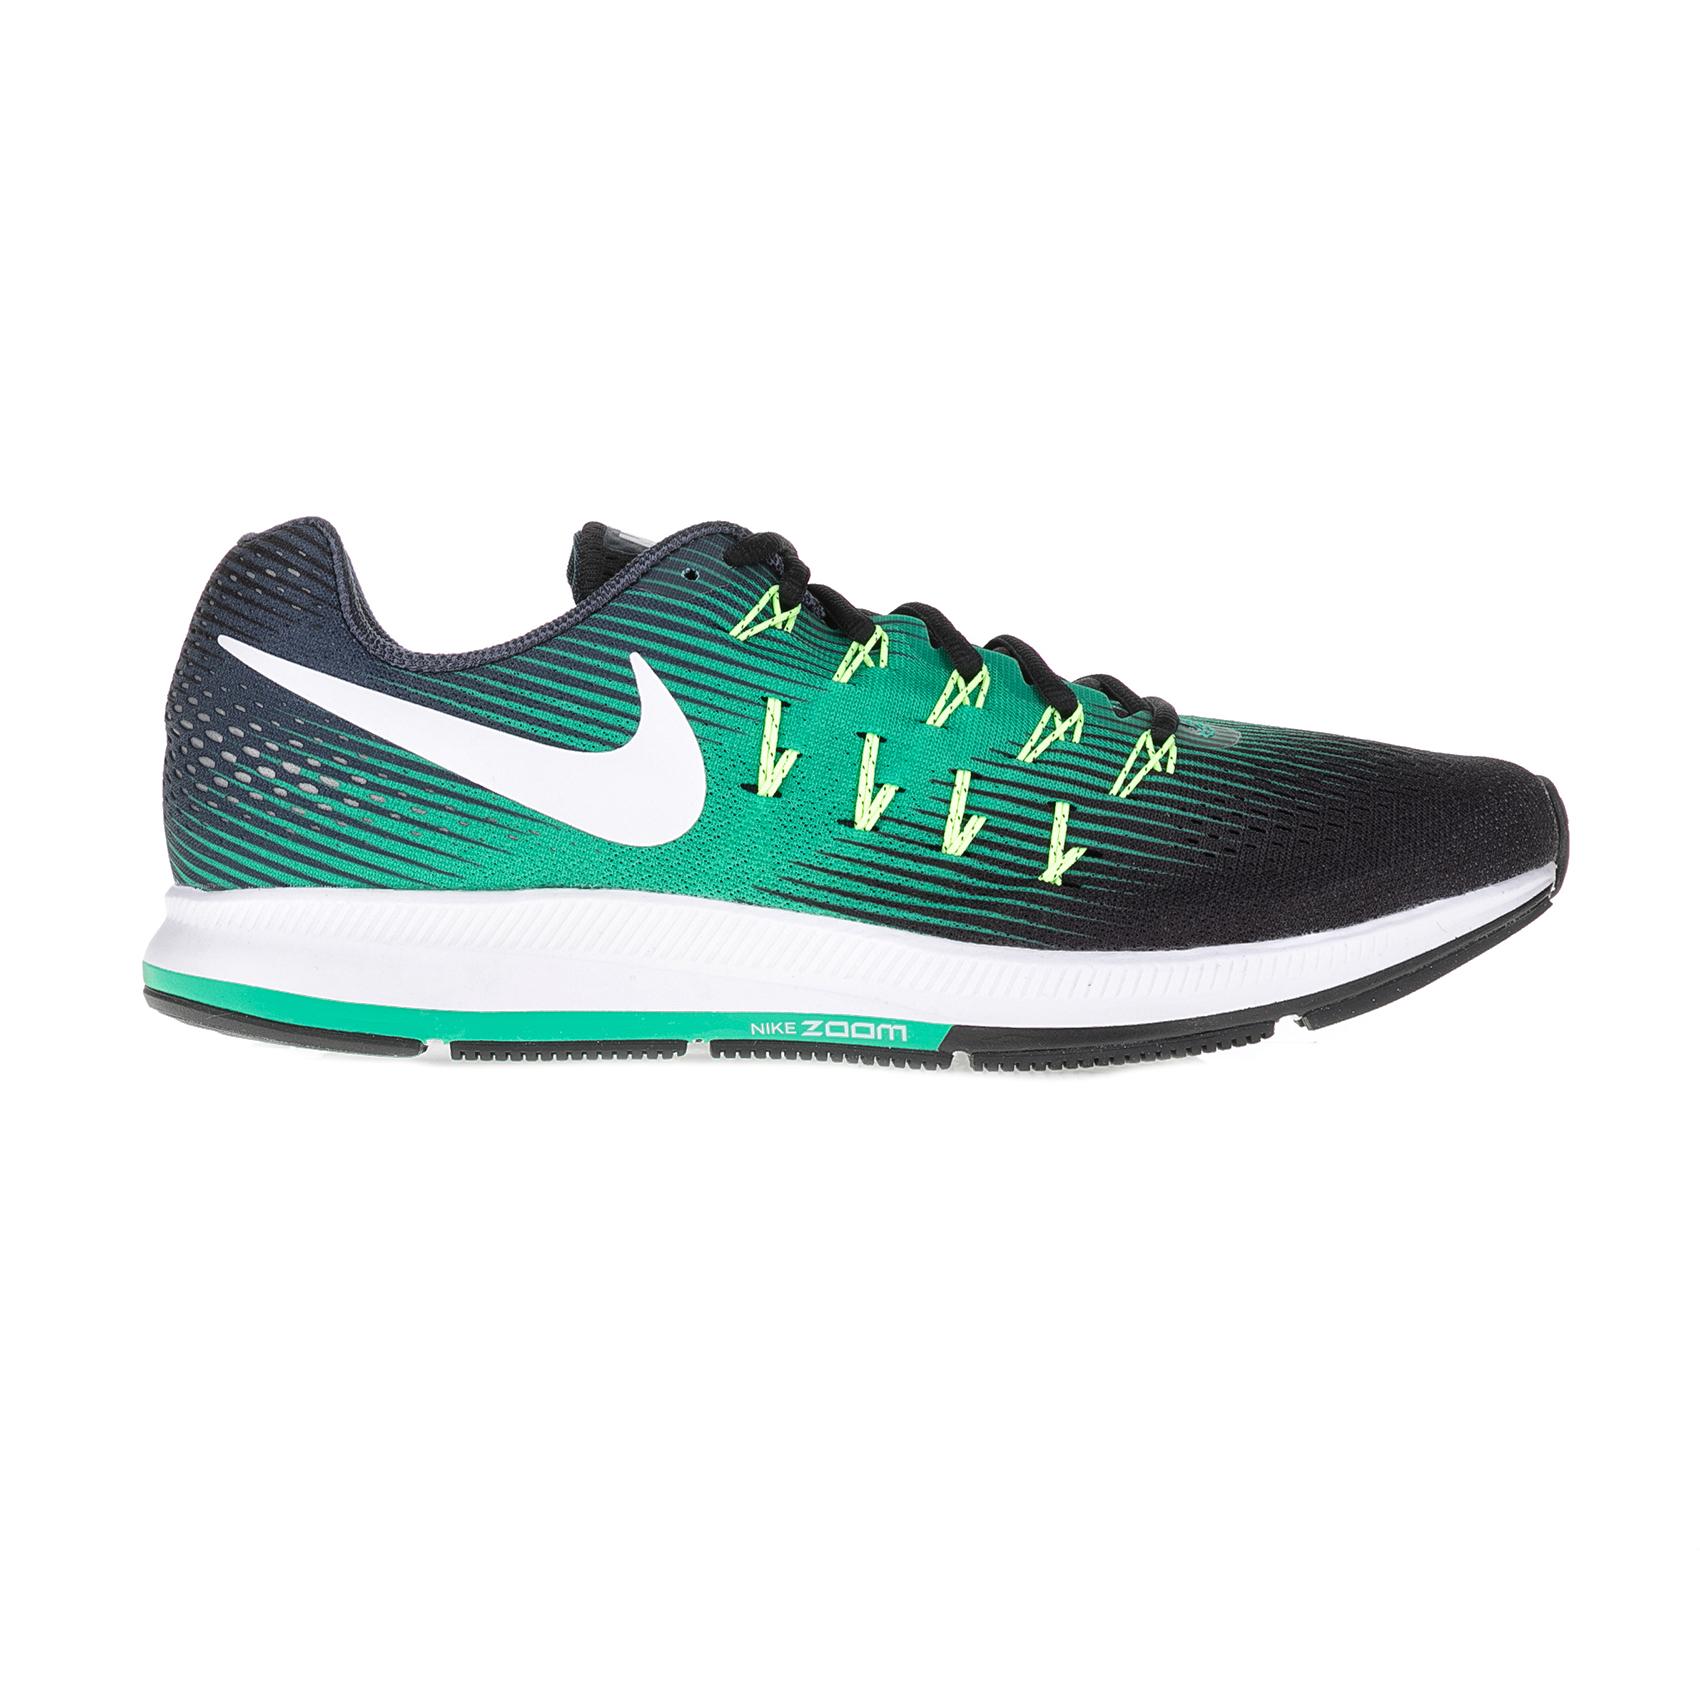 NIKE – Ανδρικά αθλητικά παπούτσια NIKE AIR ZOOM PEGASUS 33 πράσινα-μαύρα